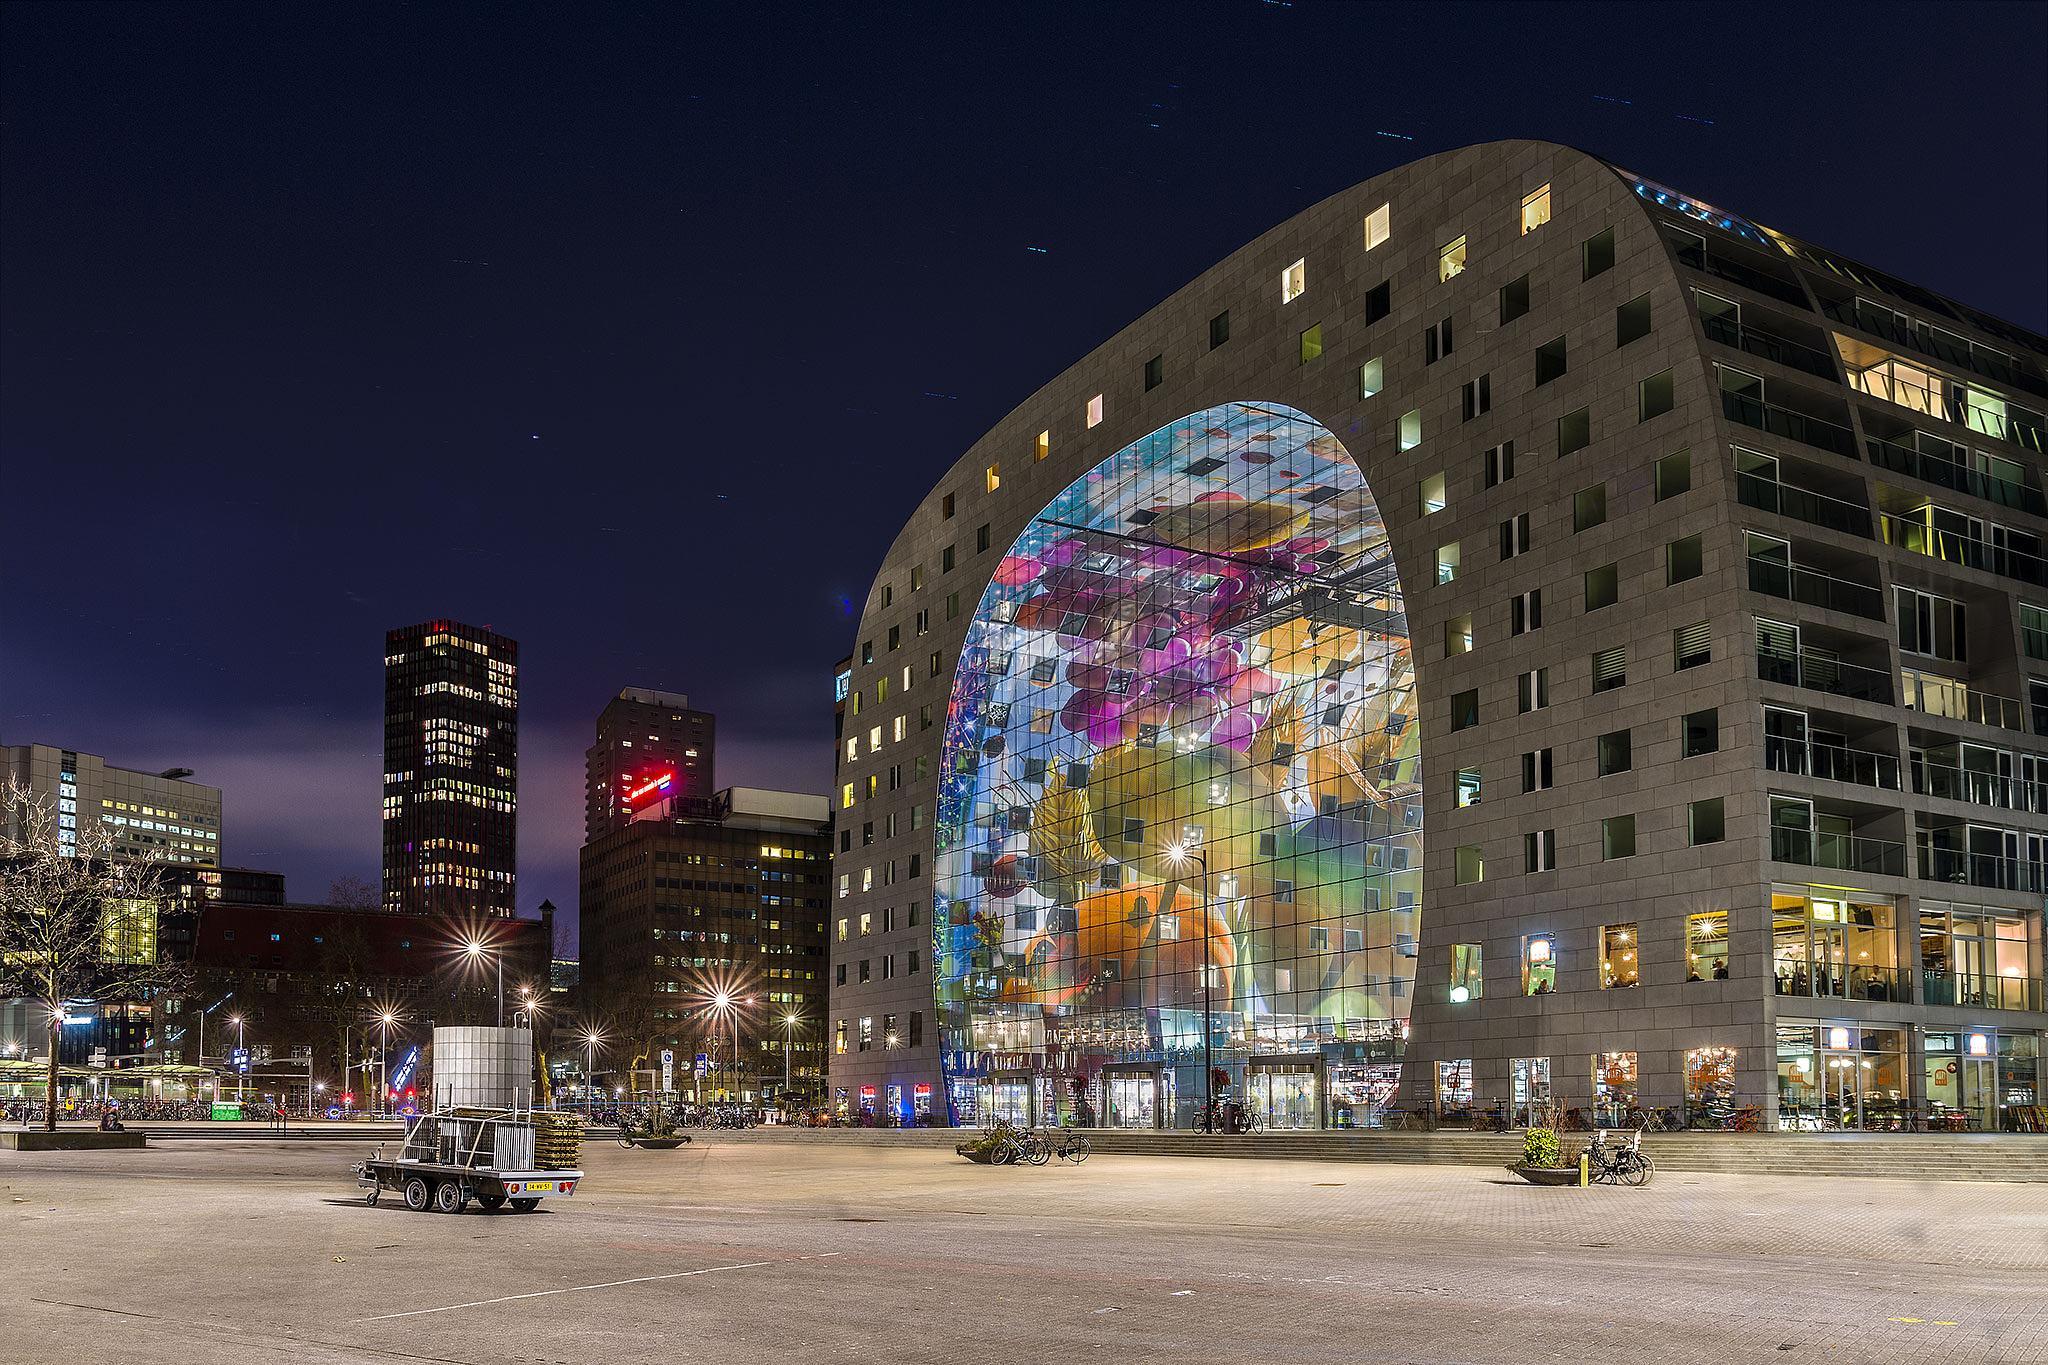 Market Hall Rotterdam by Rémon Lourier